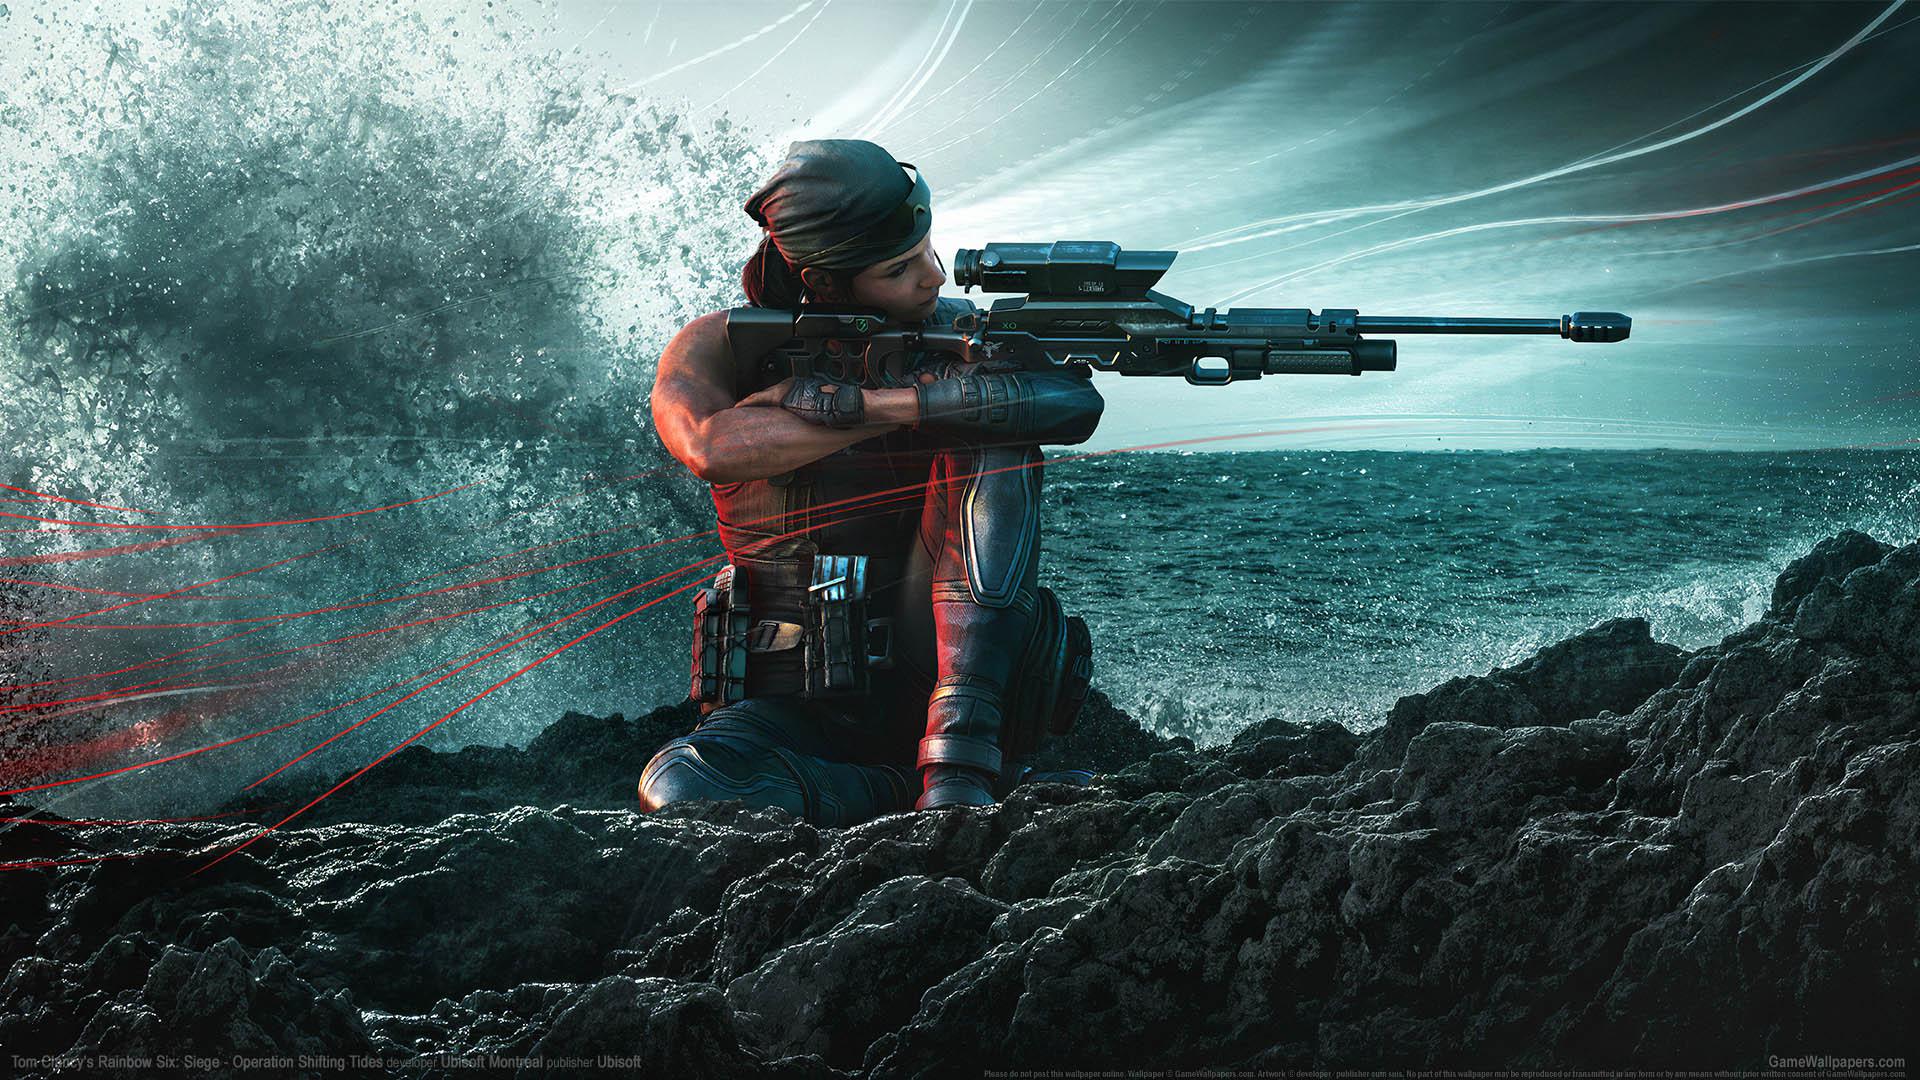 Tom Clancy's Rainbow Six: Siege - Operation Shifting Tides fondo de escritorio 01 1920x1080